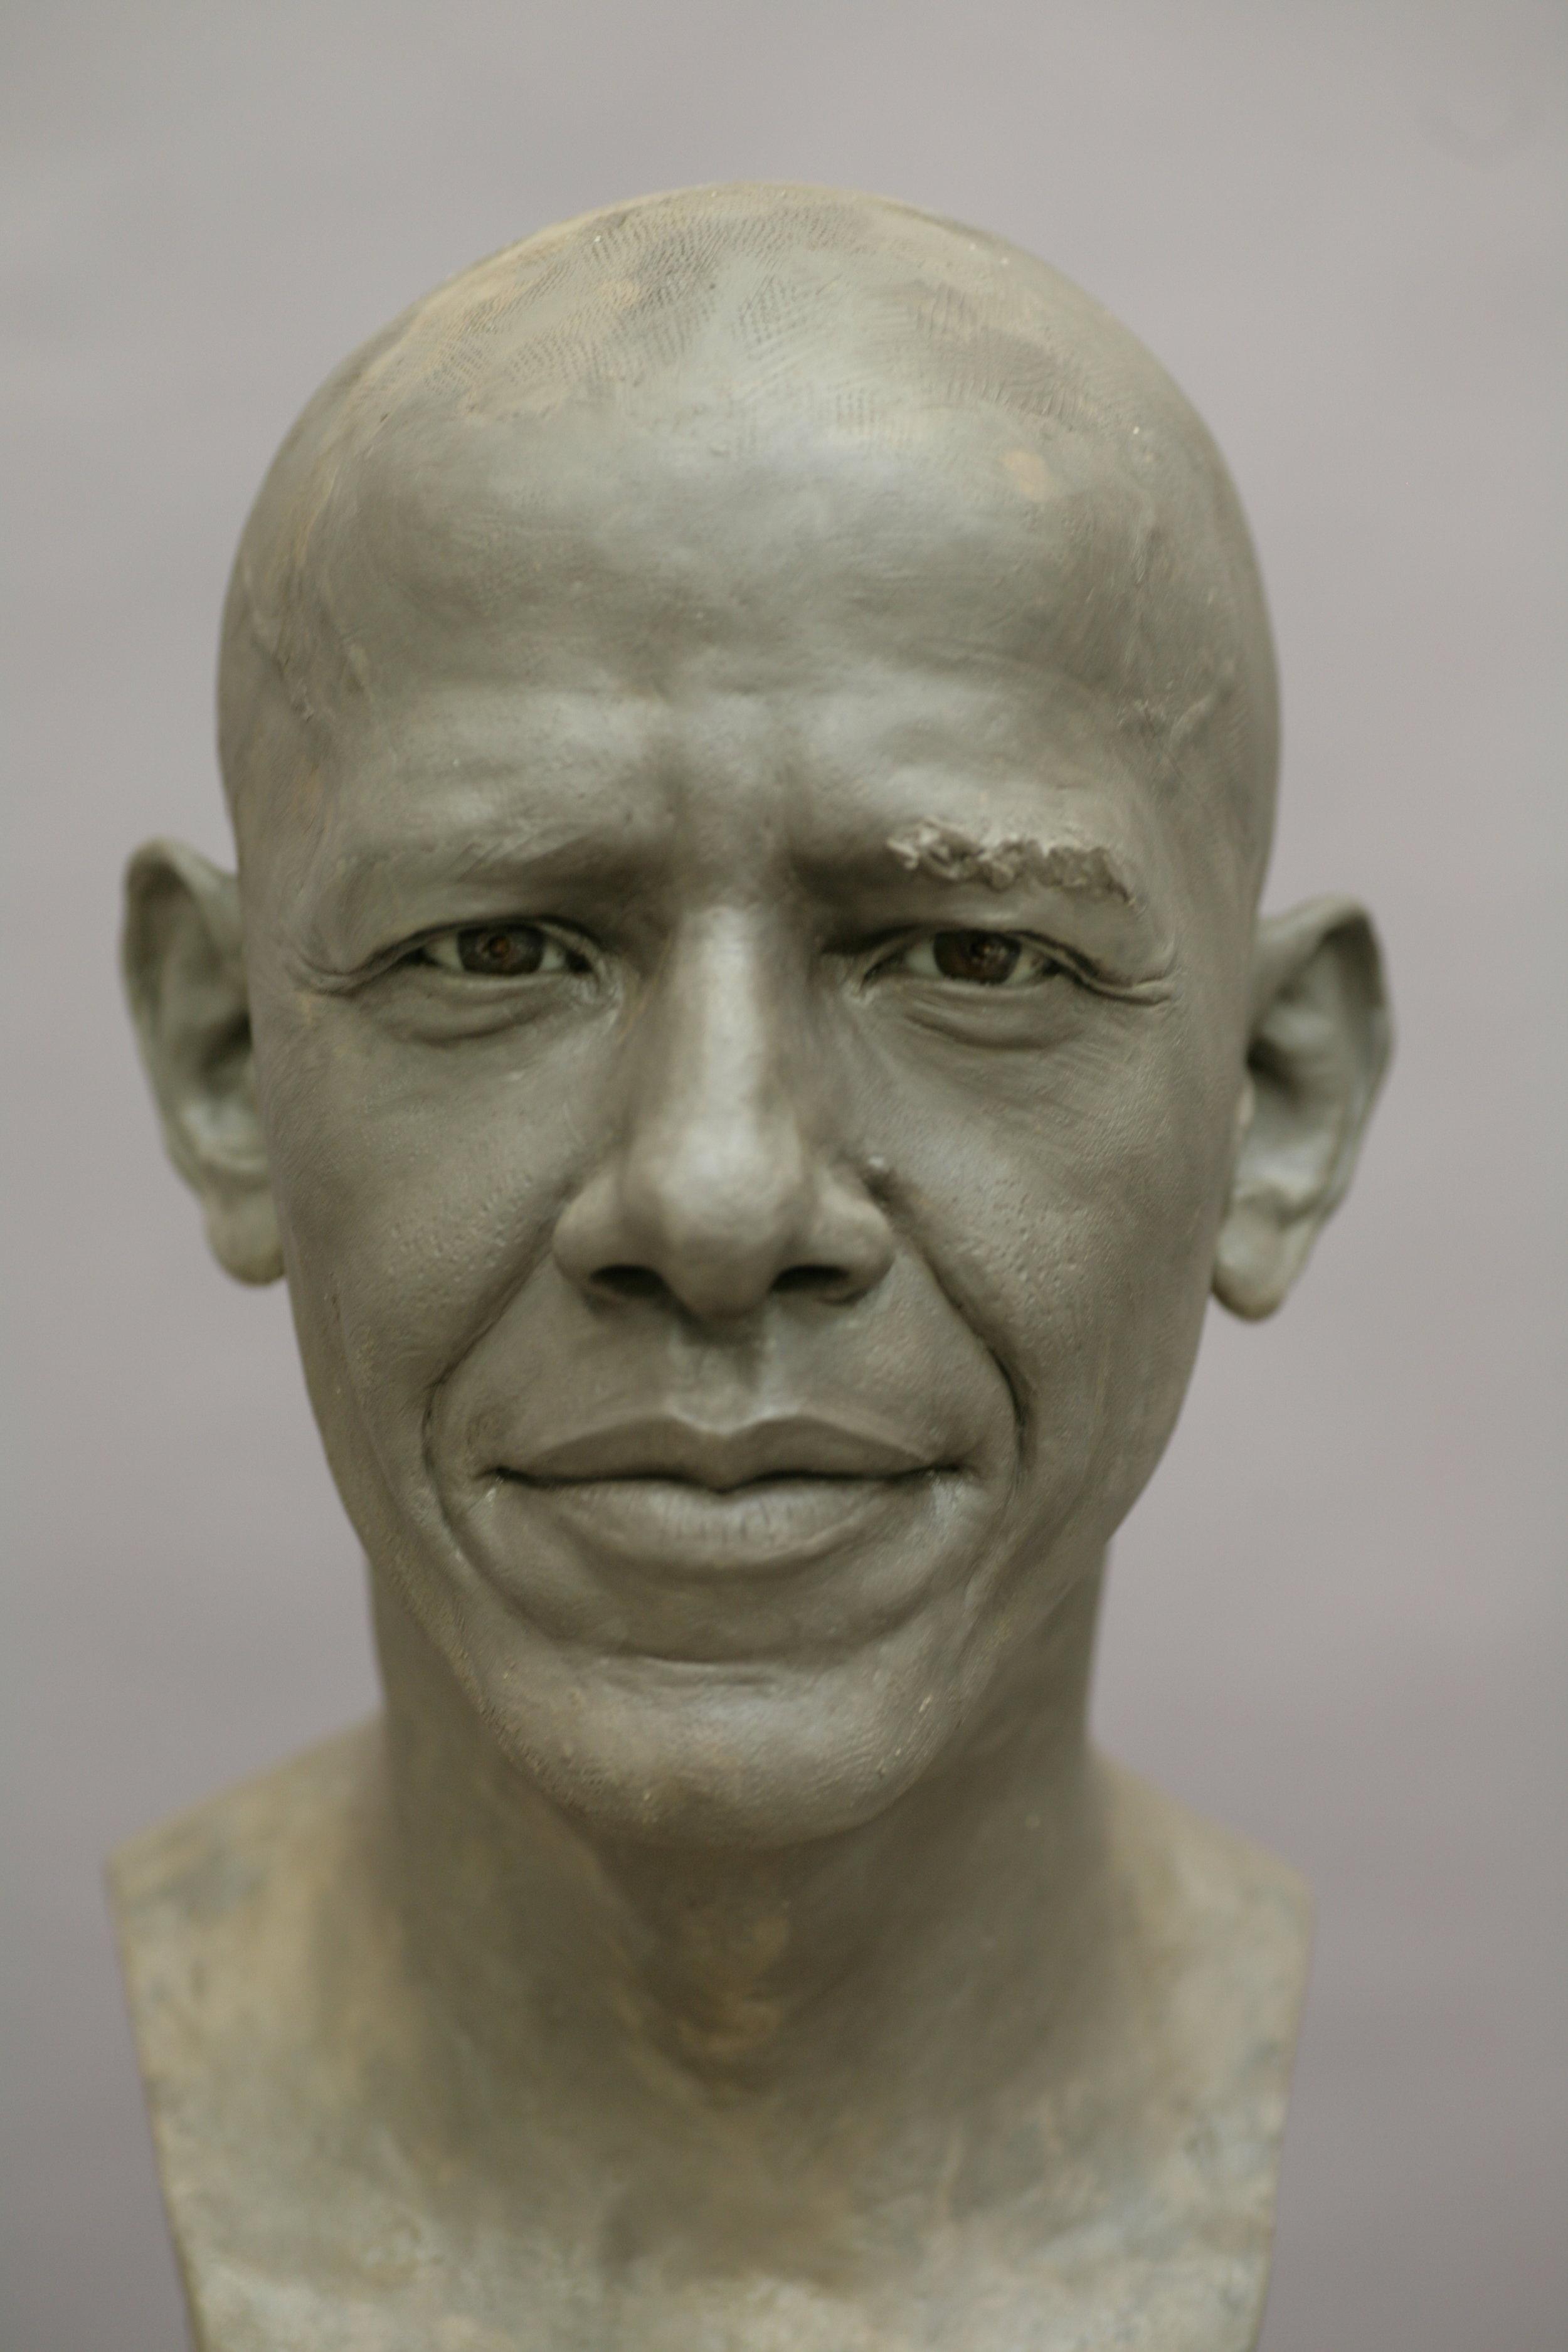 Barack Obama - Sculpture en terre par Eric Saint Chaffray - Credit Musée Grévin